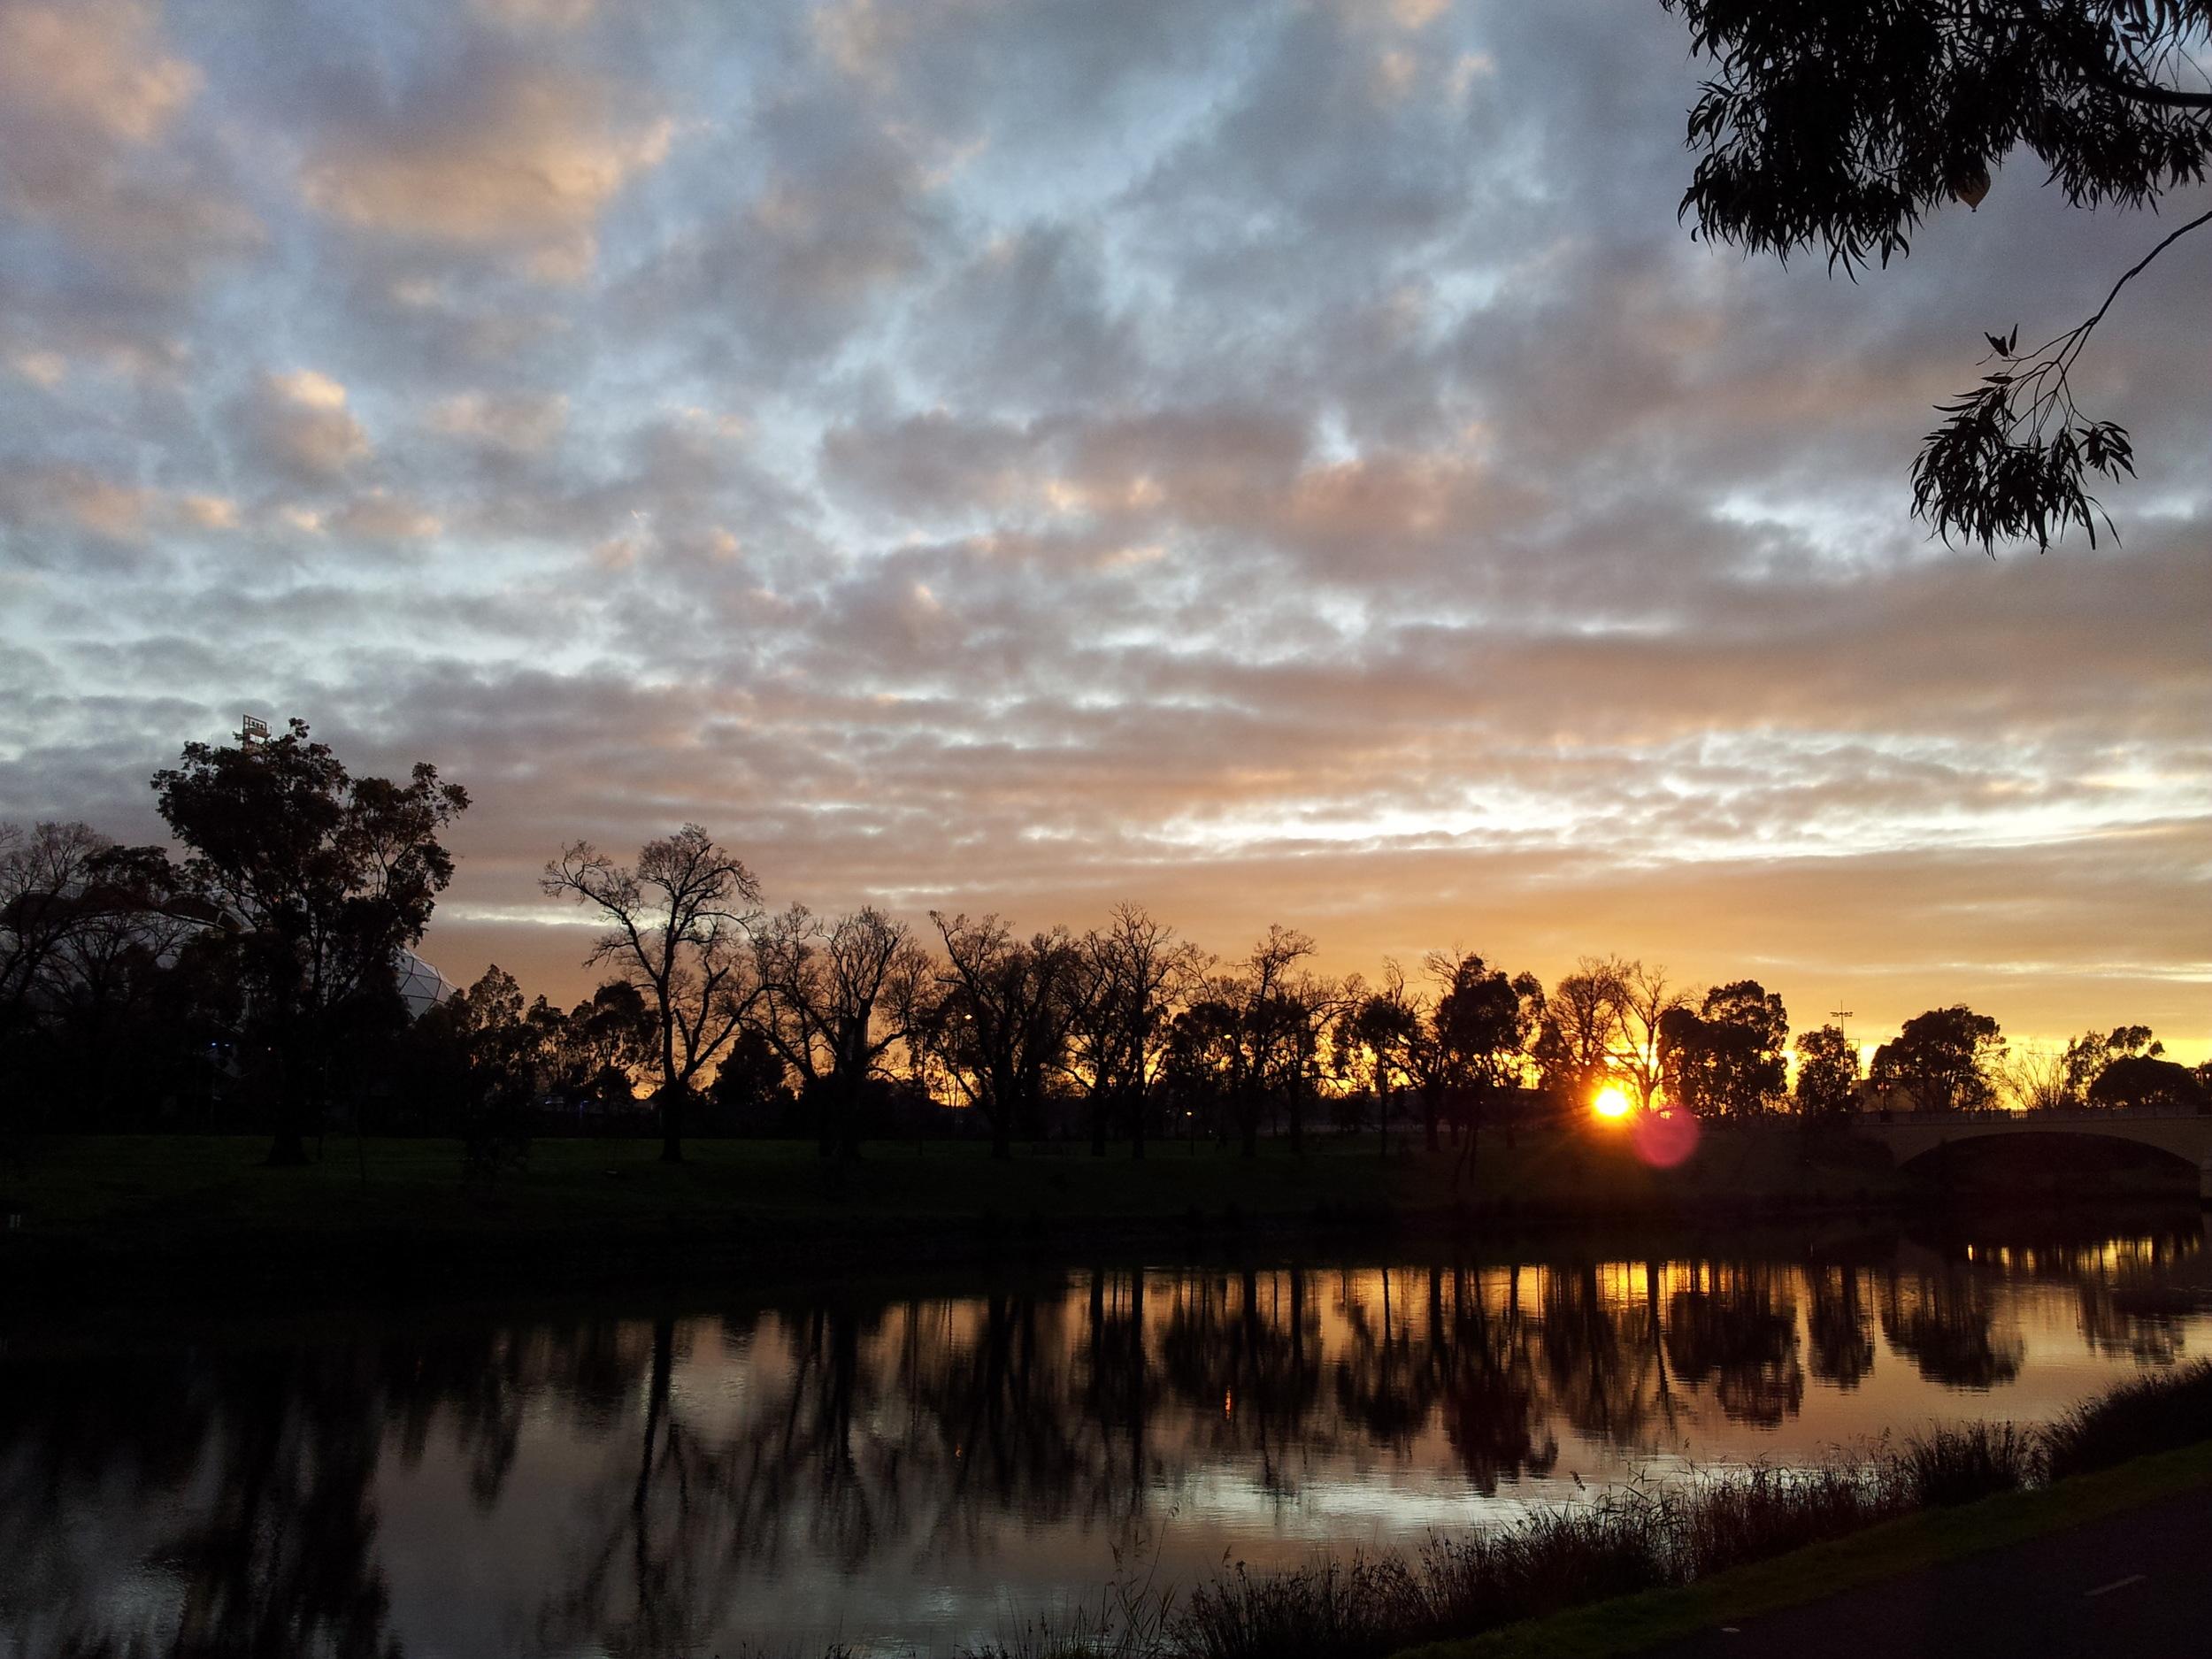 Sunrise over the Yarra River. Image: Paul Jones